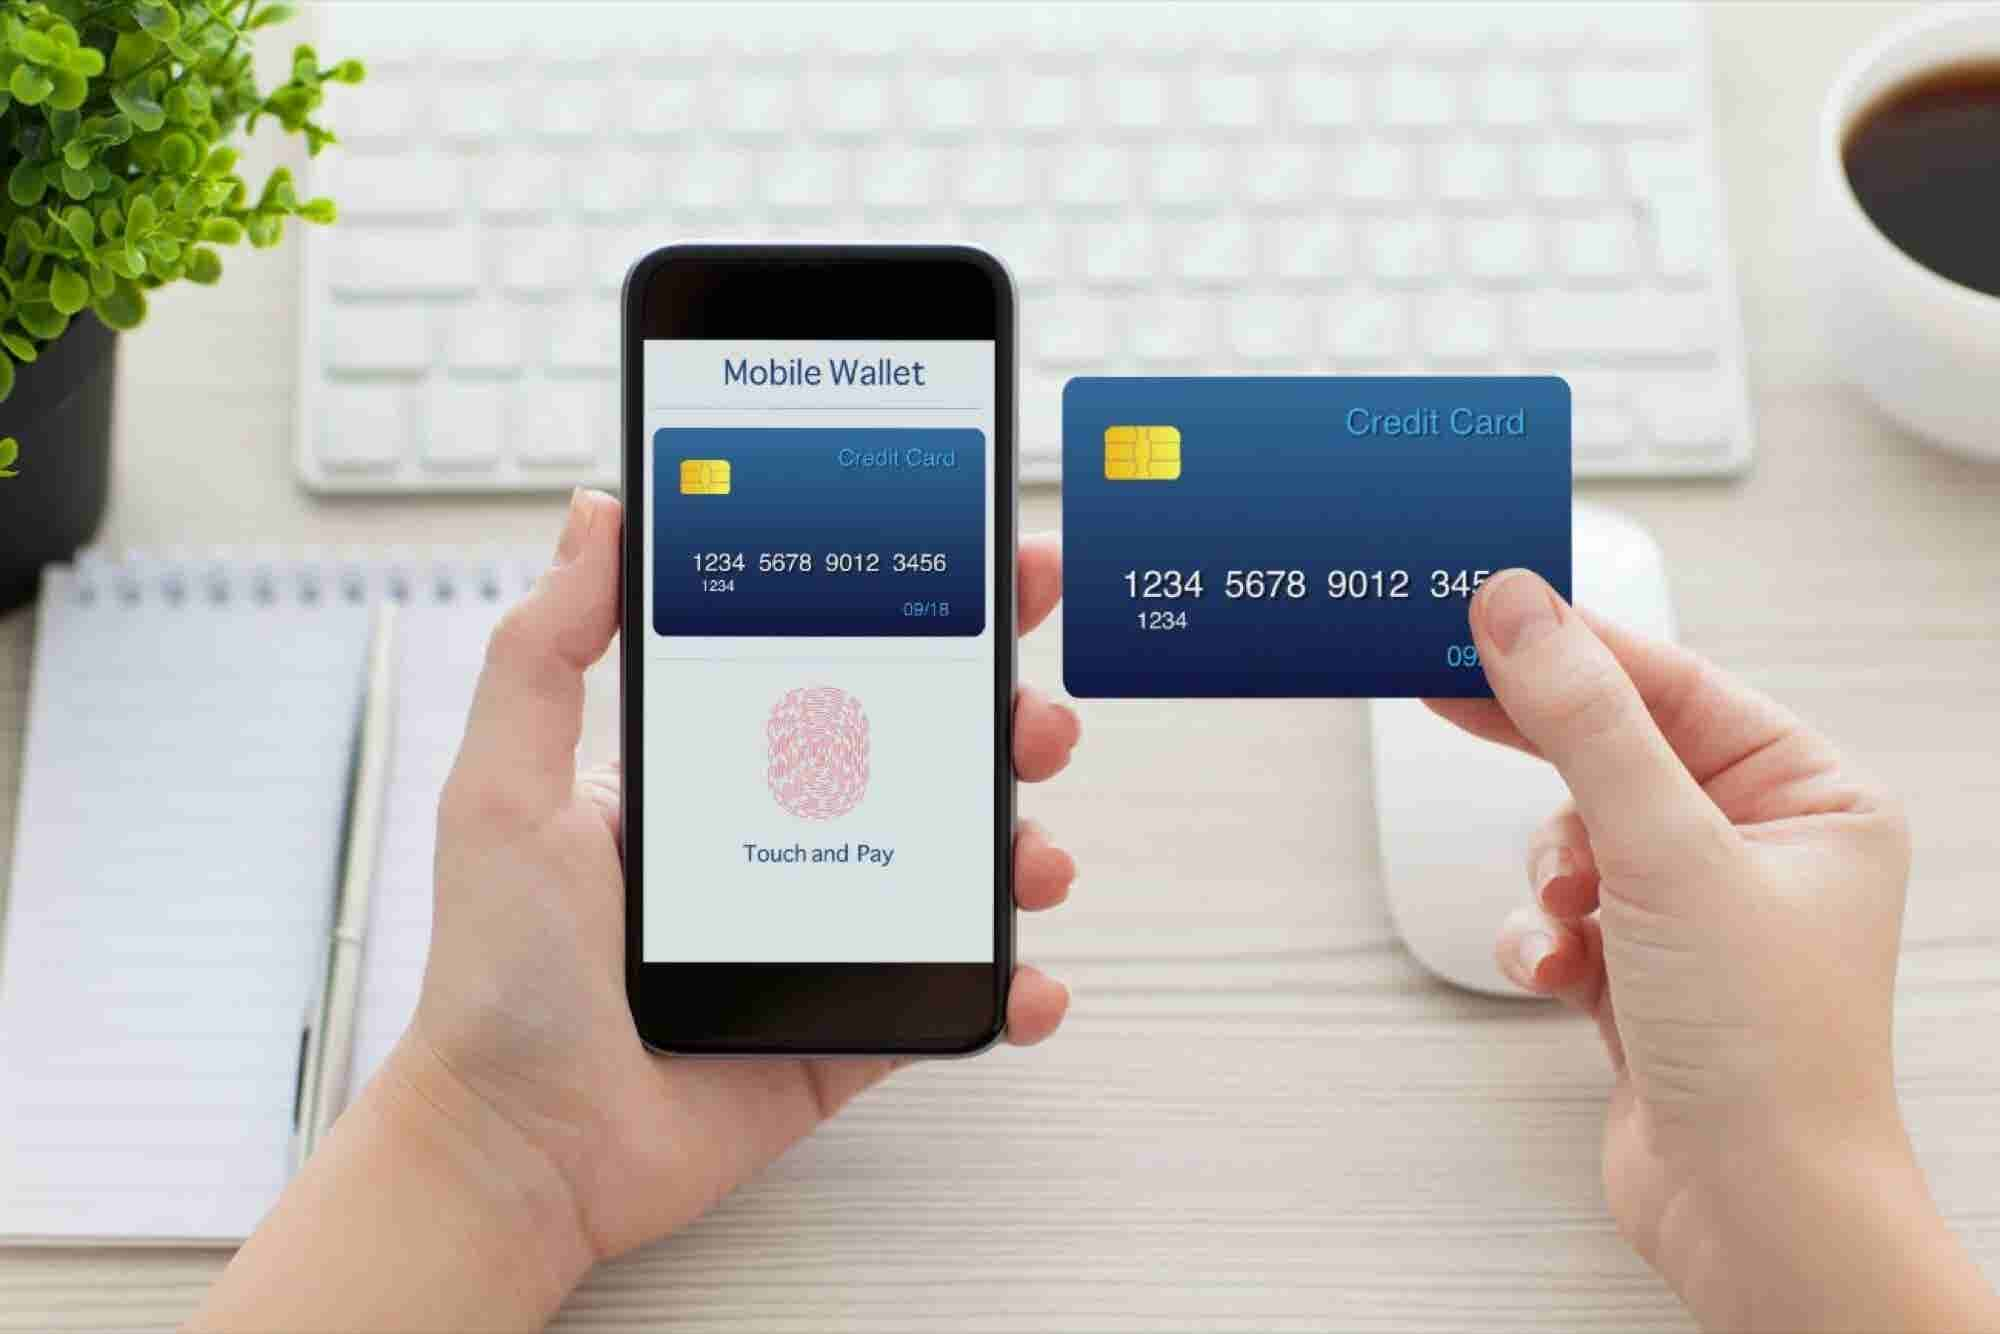 Fintech Vs. Banca Tradicional: ¿Amenaza u Oportunidad?